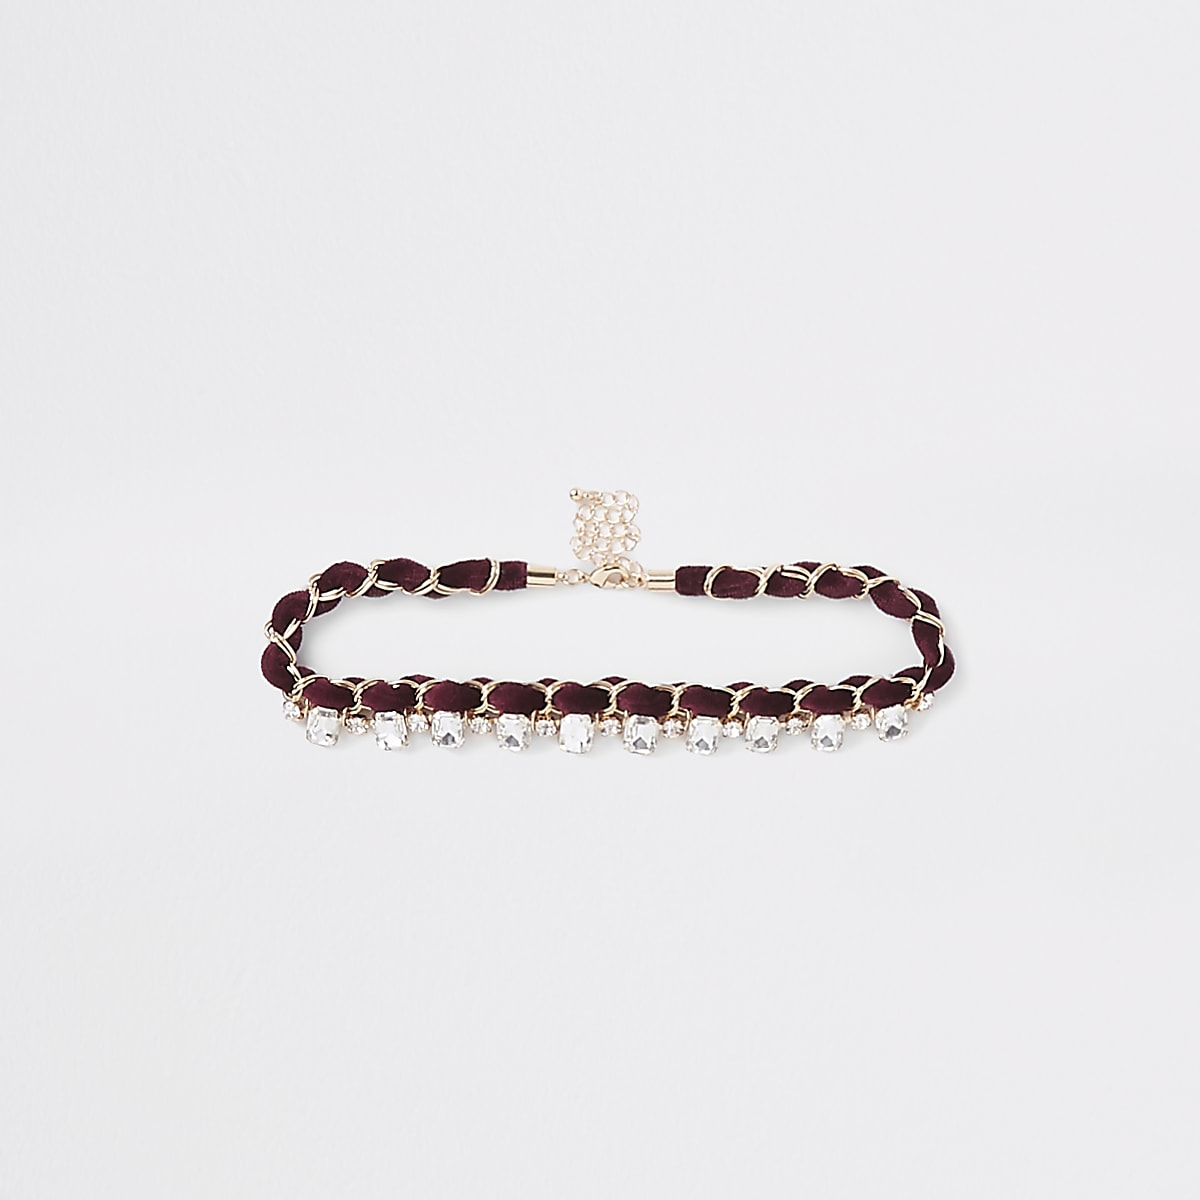 Dark red jewel embellished chain choker